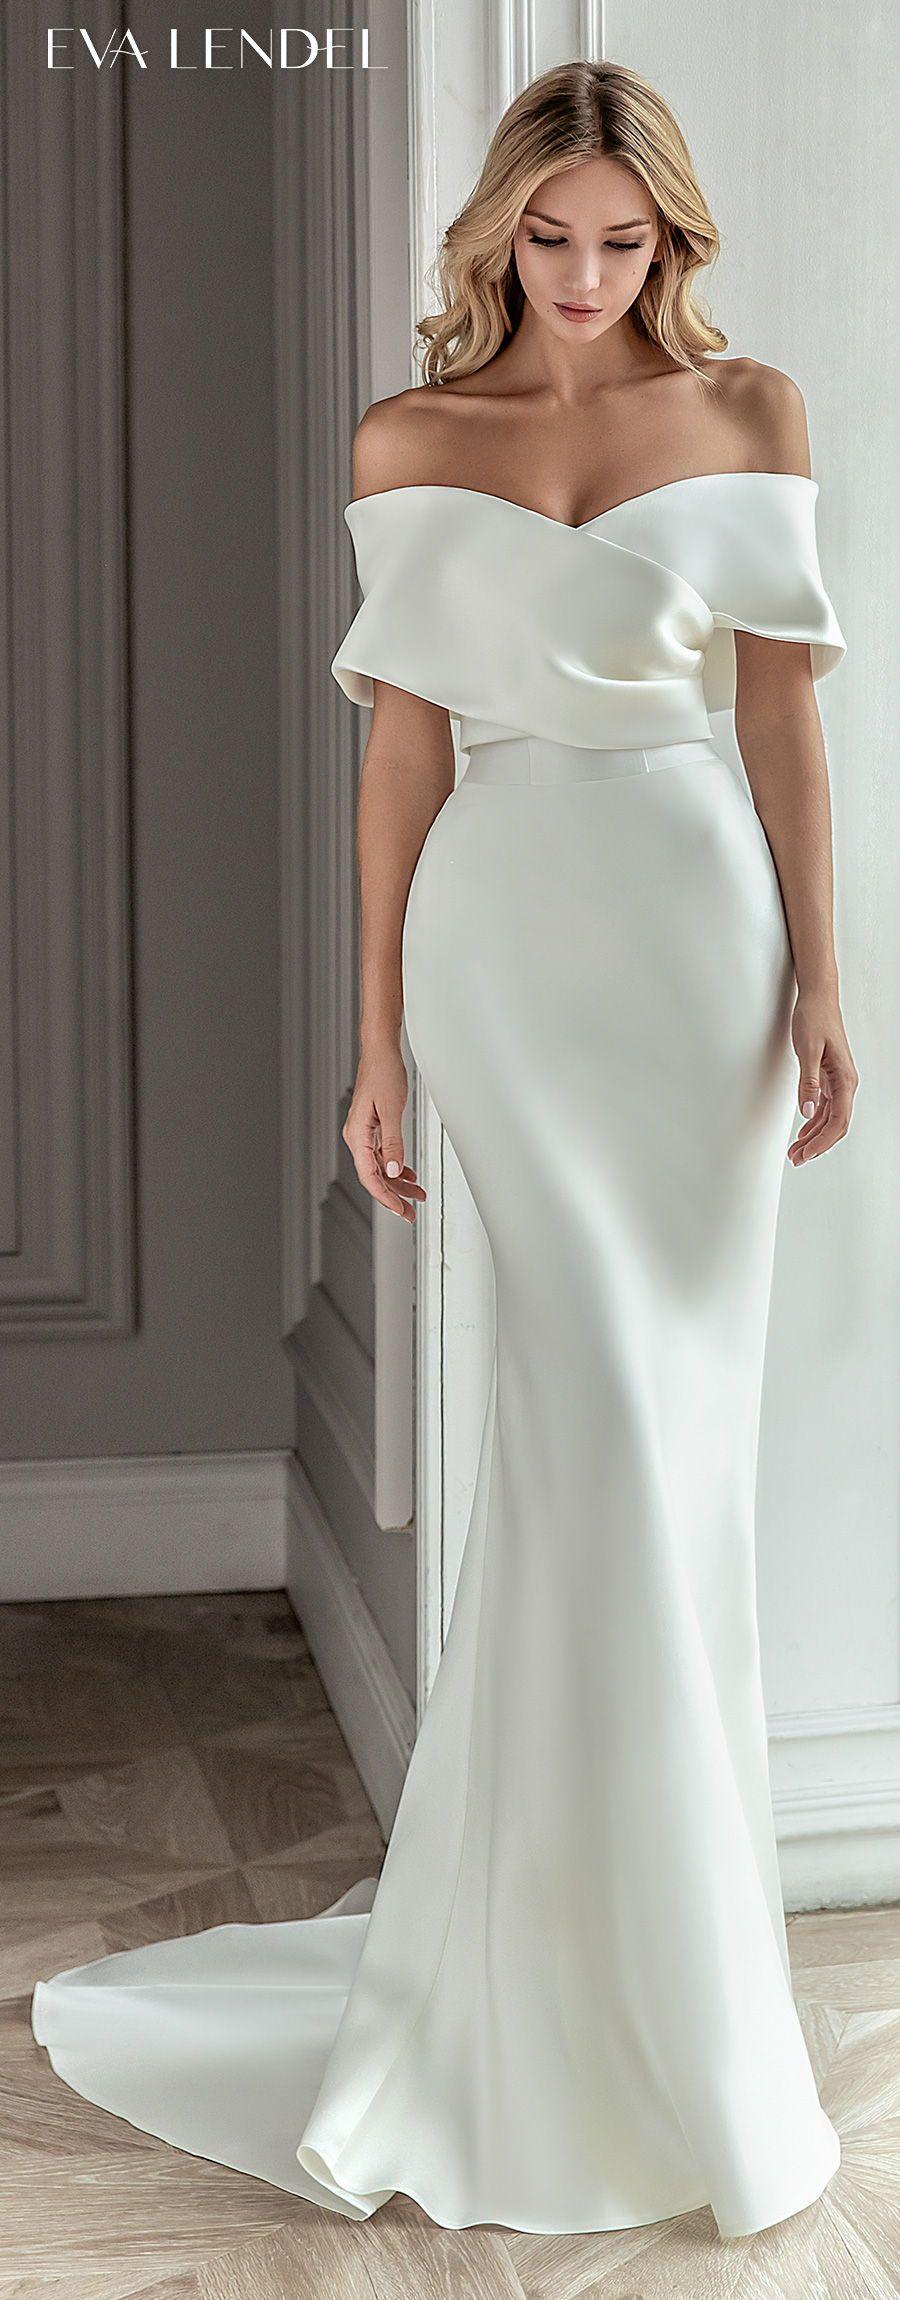 Eva Lendel 2021 Wedding Dresses — 'Less is More' Bridal Collection